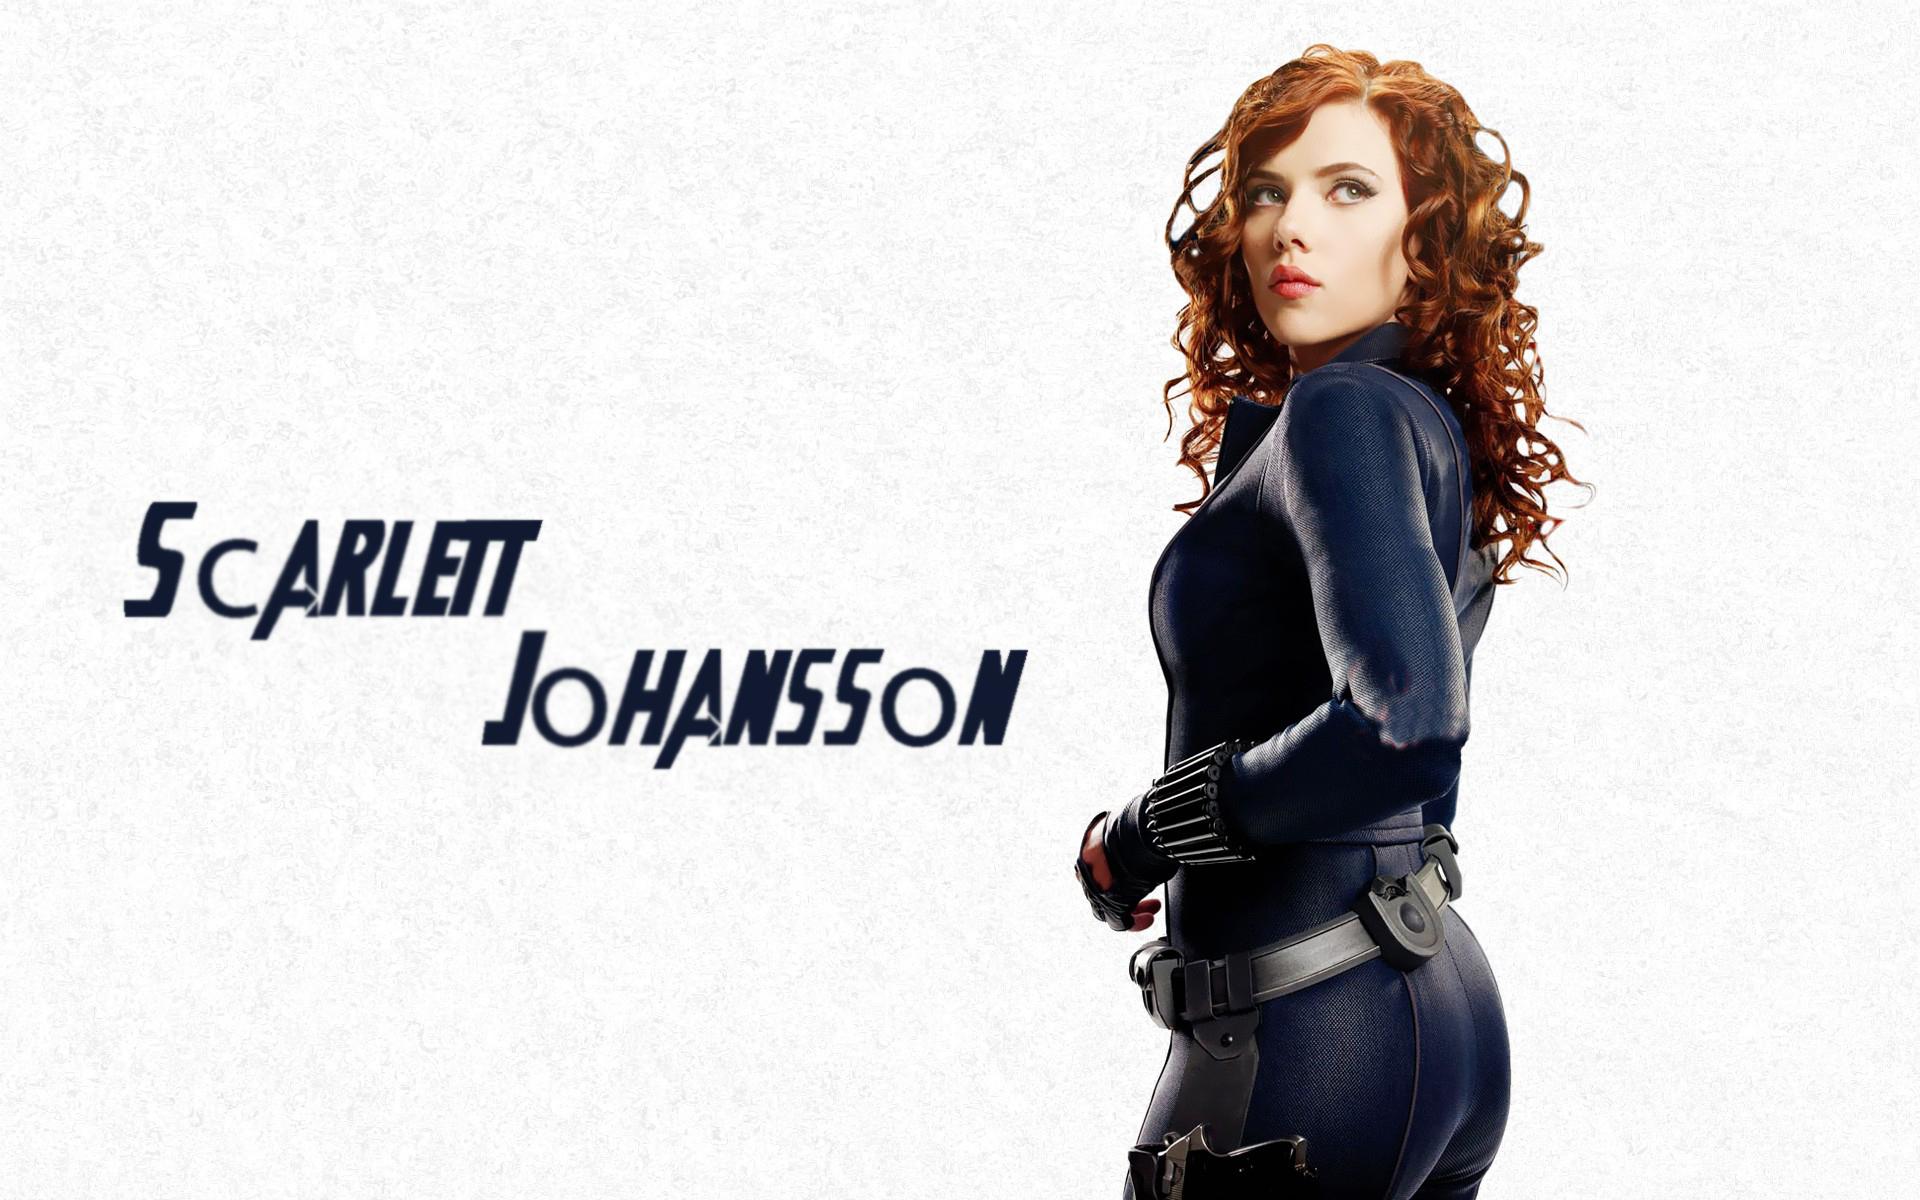 High Quality Hds Pics Of Scarlett Johansson As Redhead: Scarlett Johansson Avengers Wallpaper